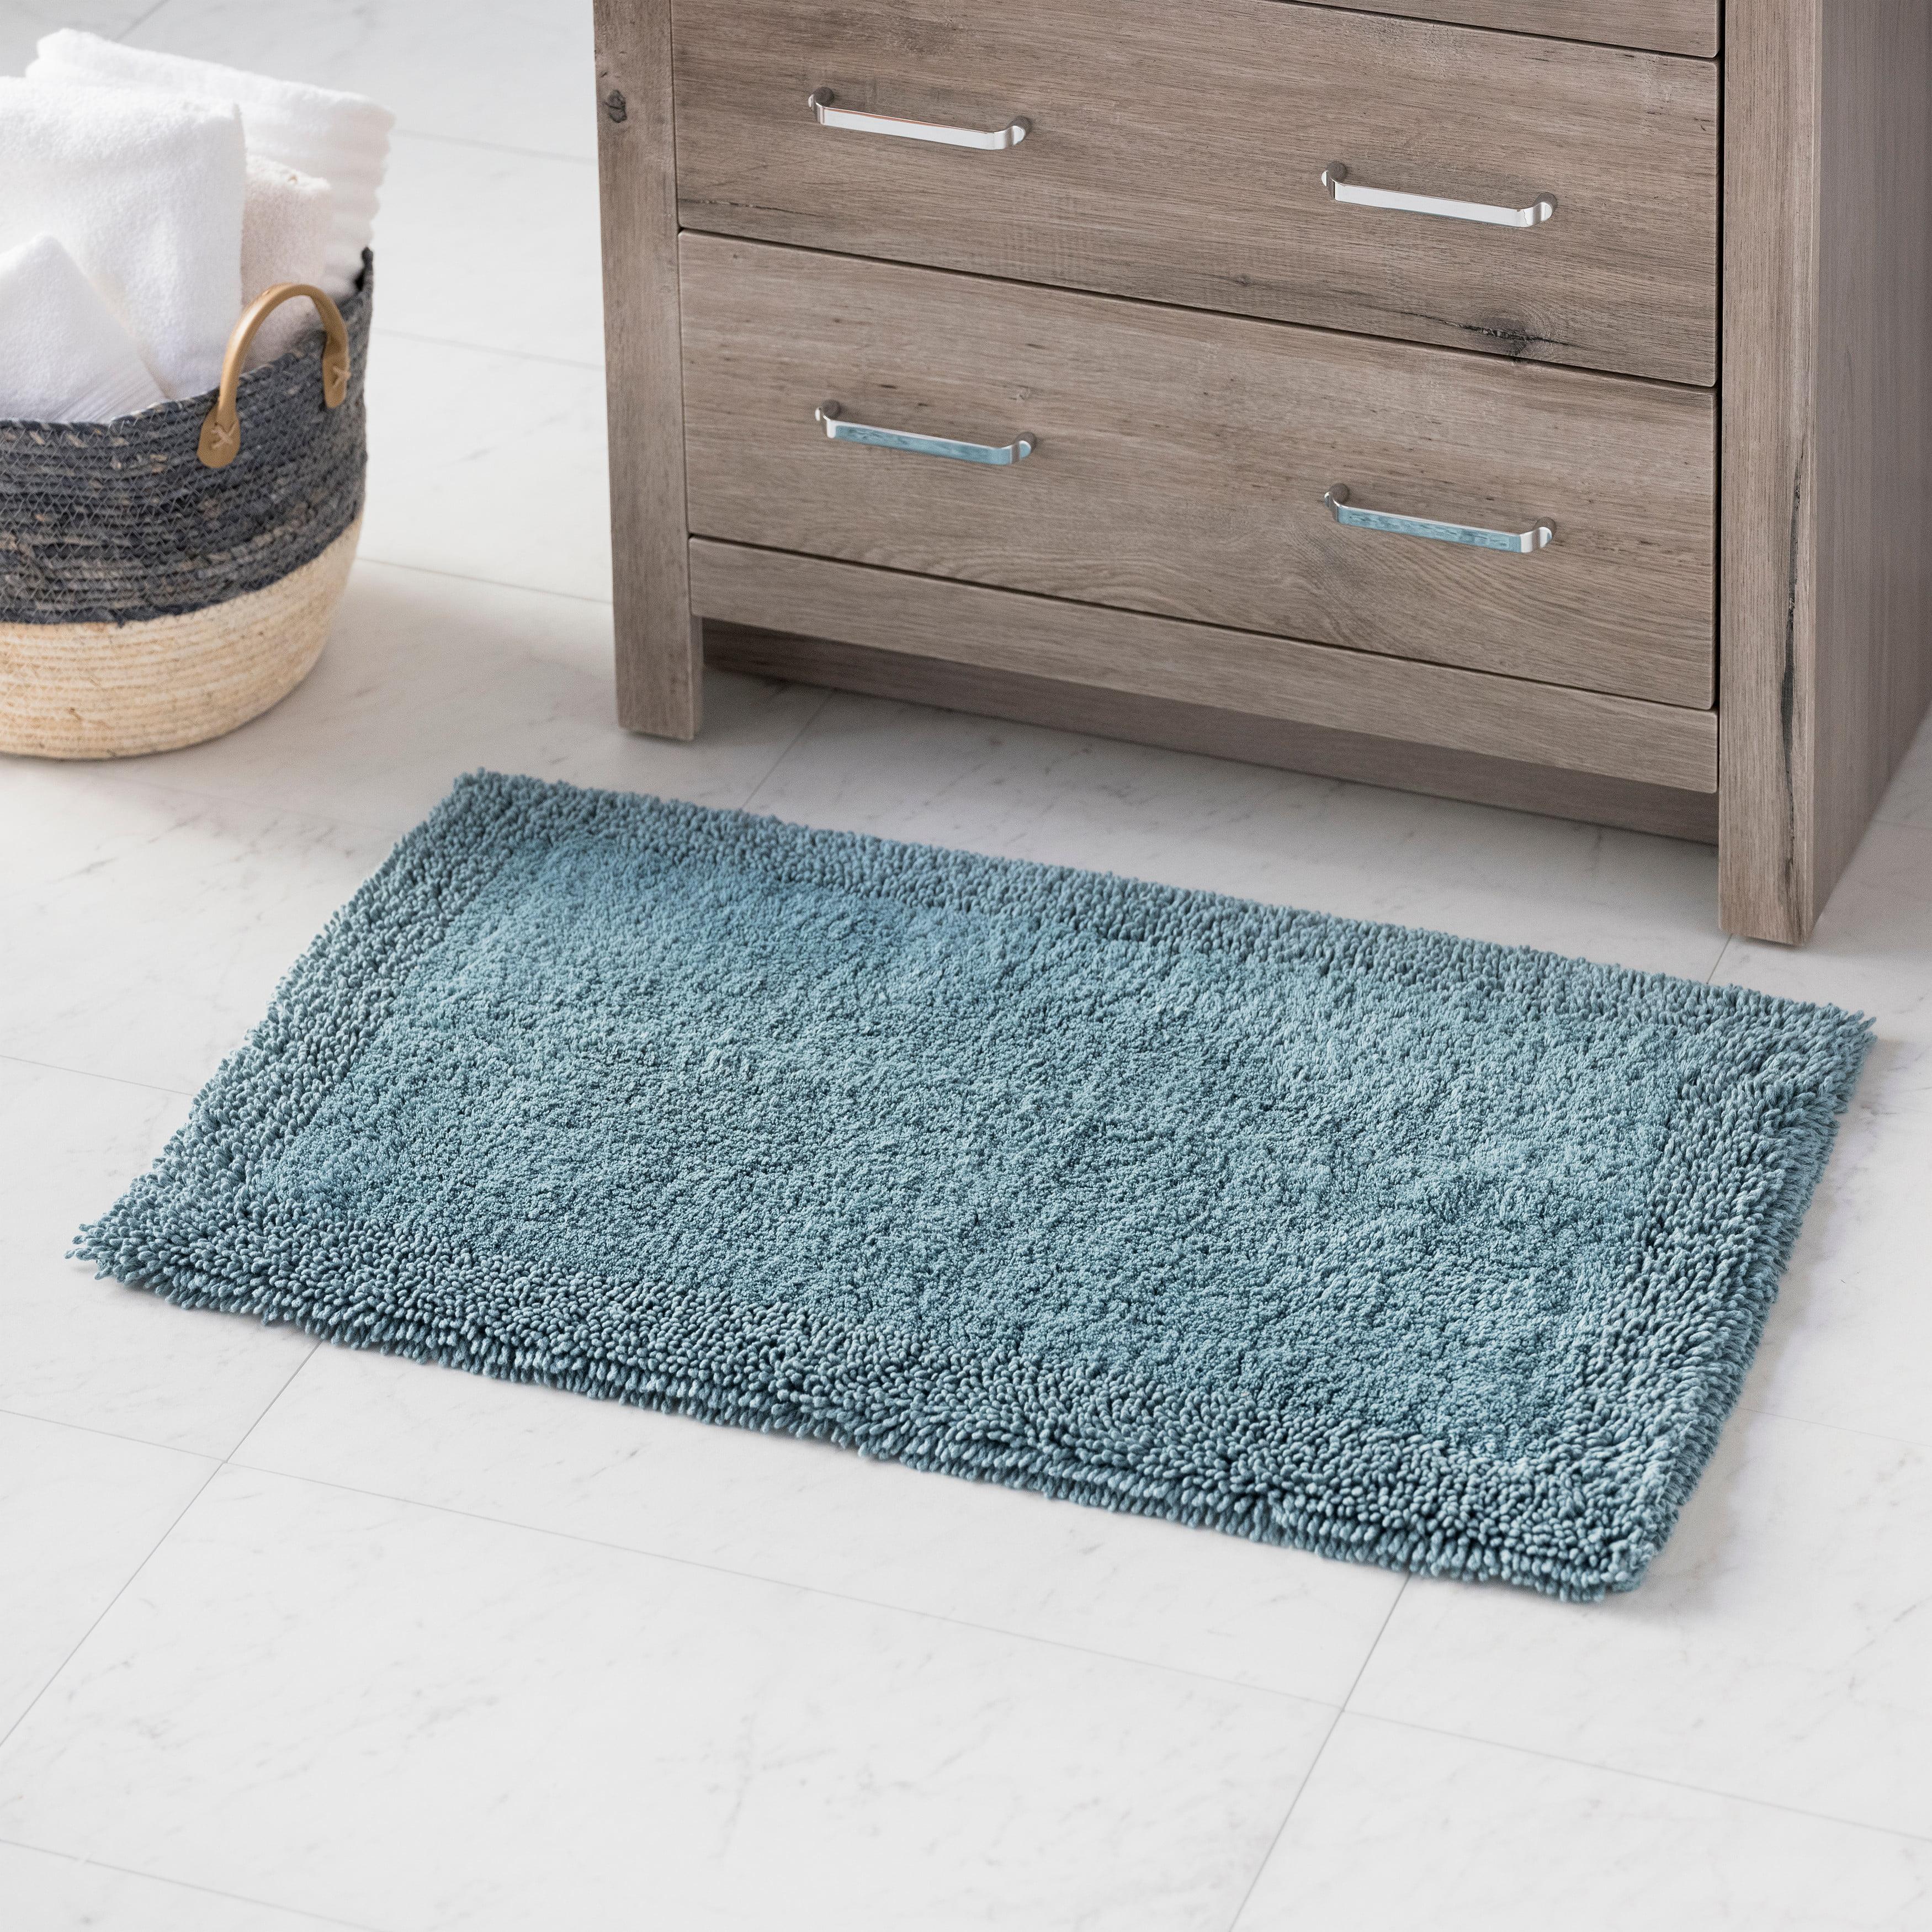 Hotel Style Cotton Blend Solid Bath Rug 17 X 24 Teal Walmart Com Walmart Com